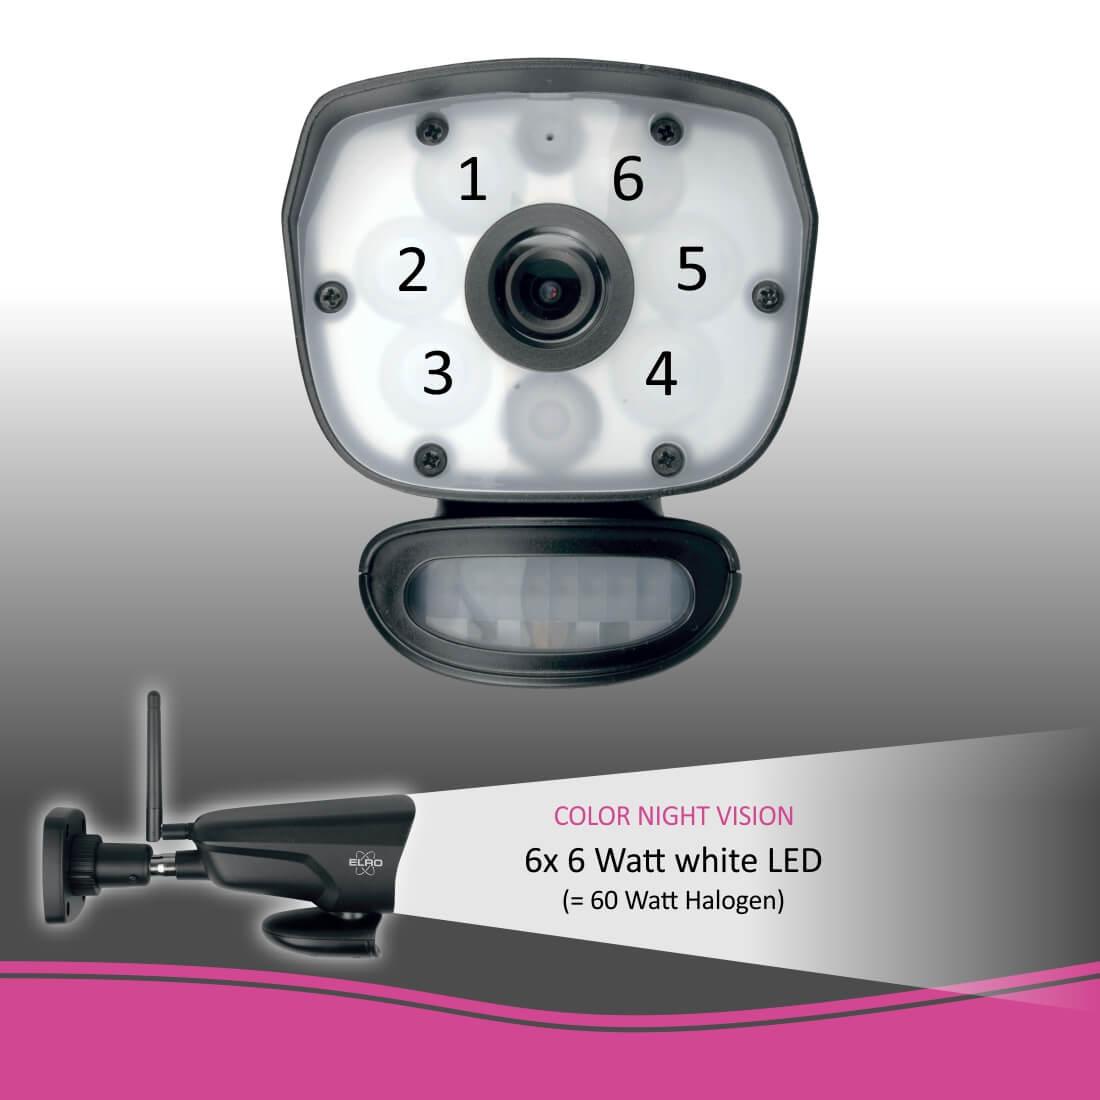 ELRO Colour Night Vision LED's